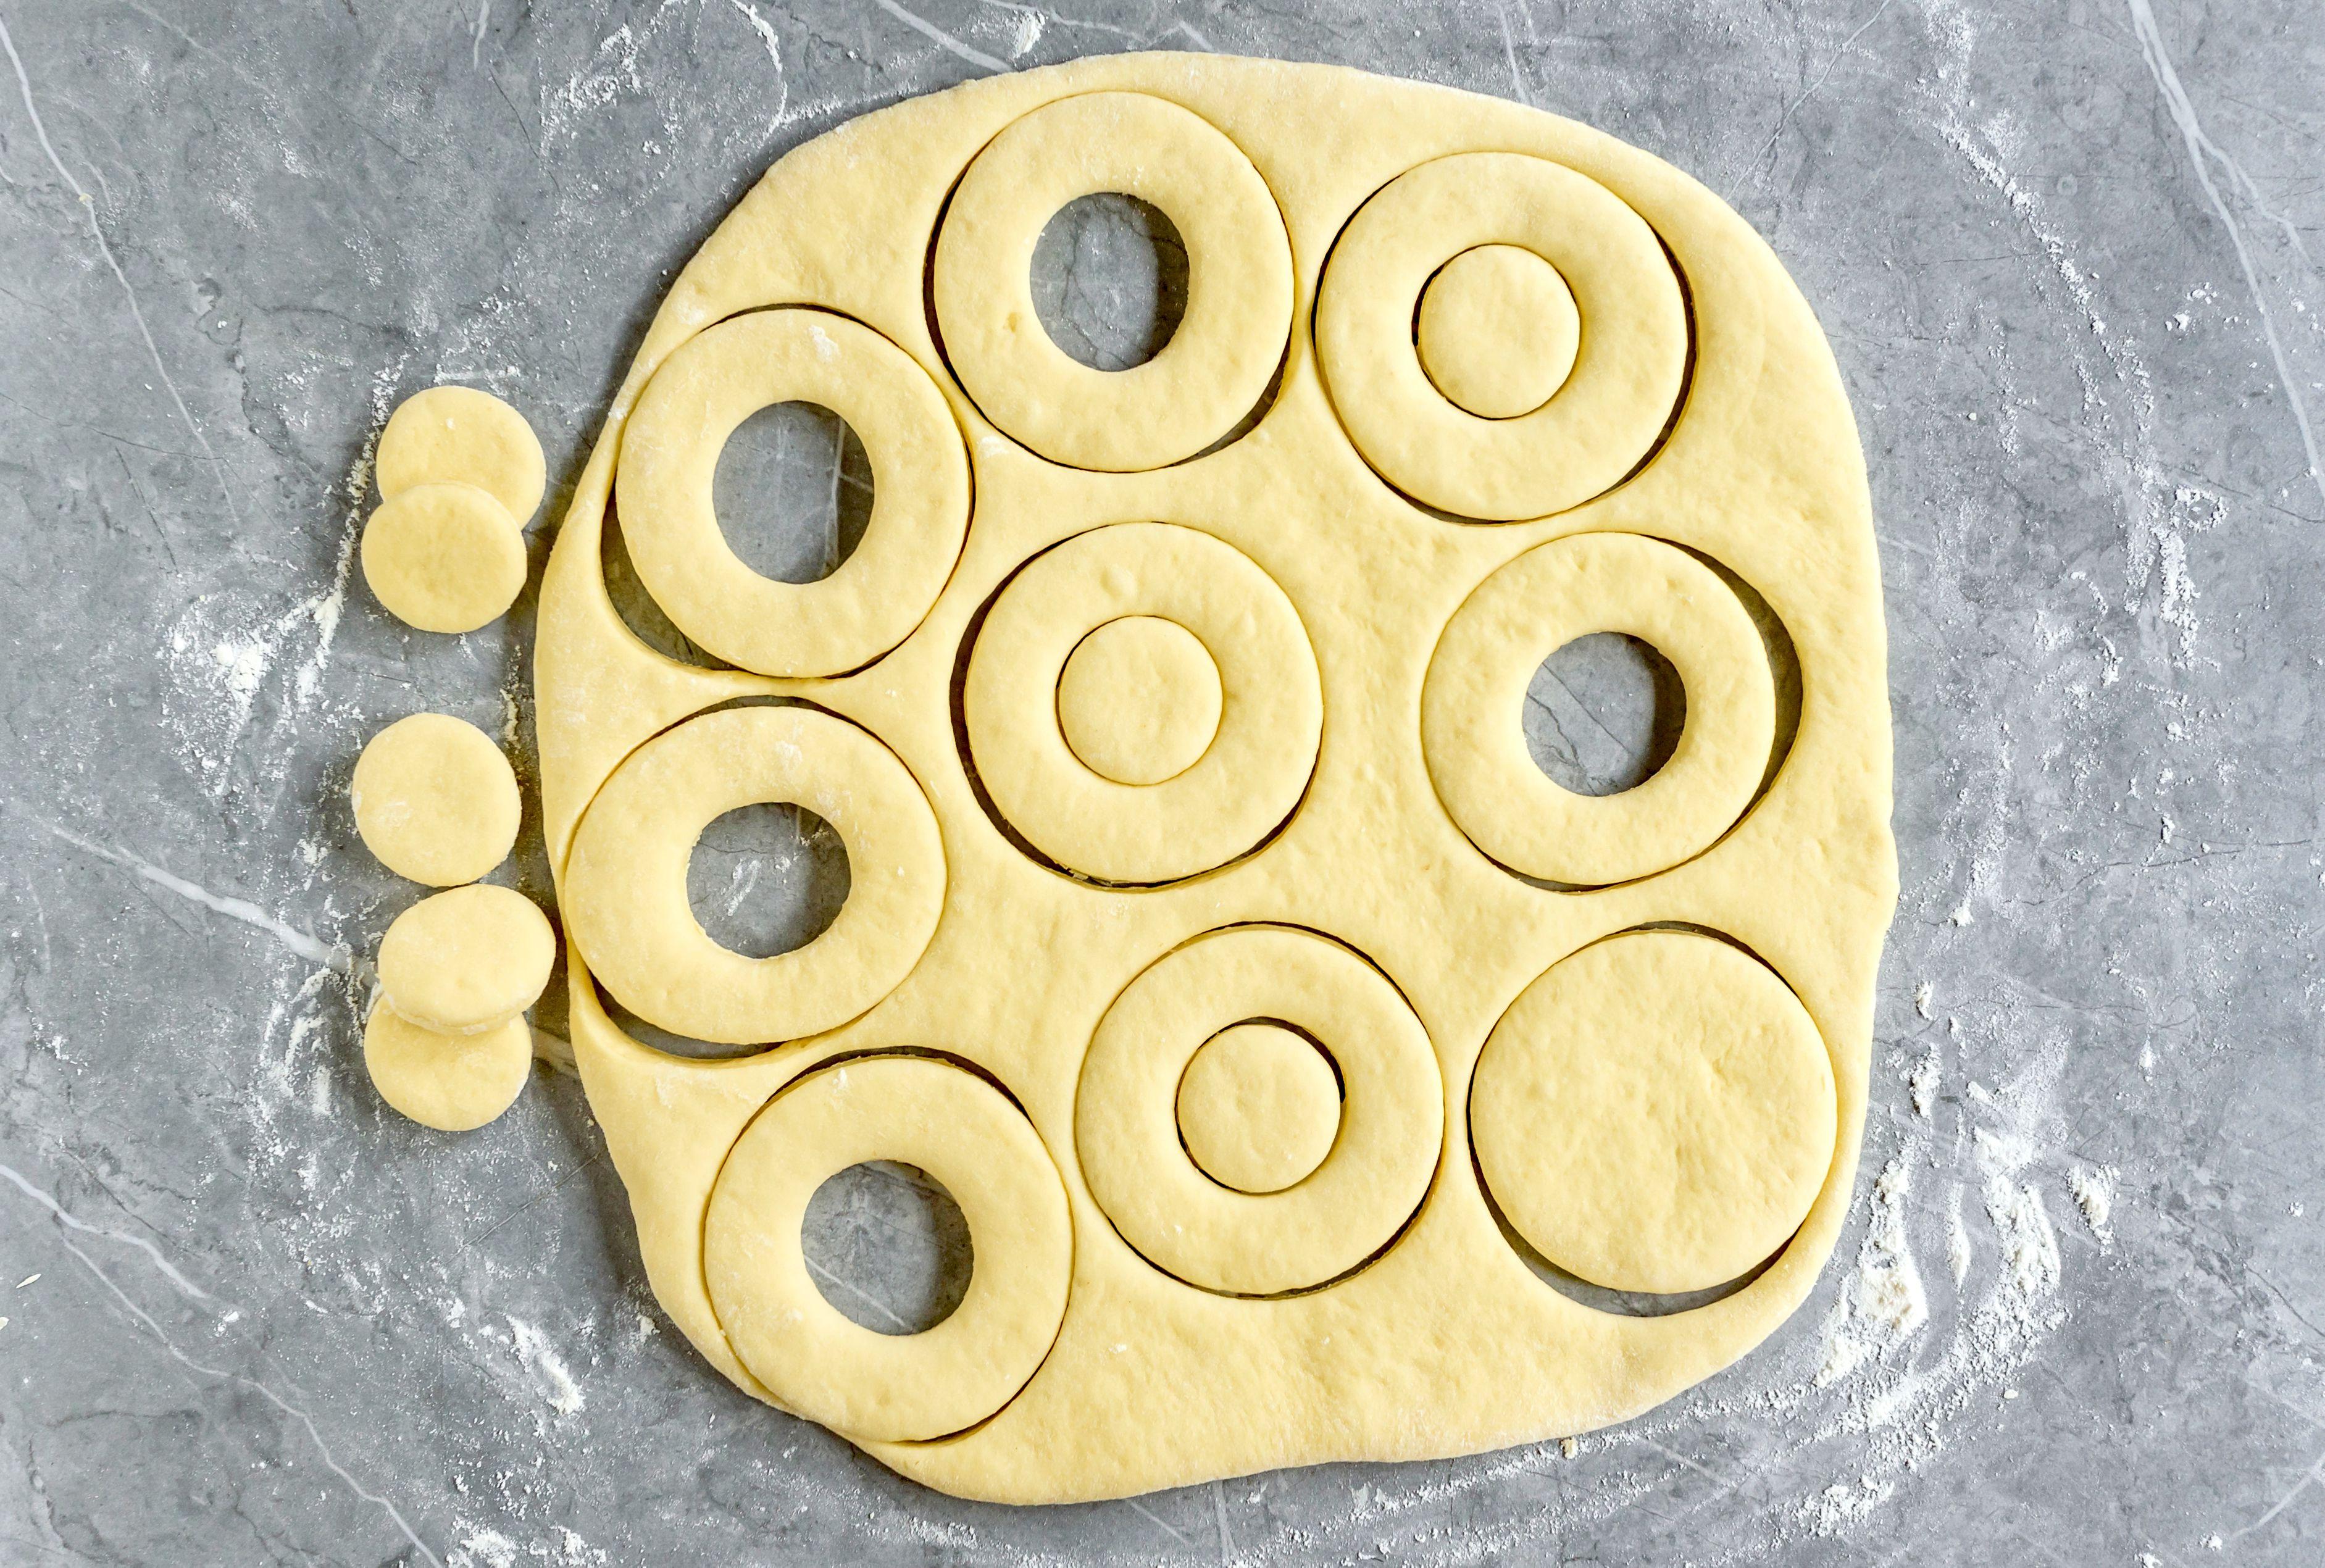 Doughnuts being cut from dough